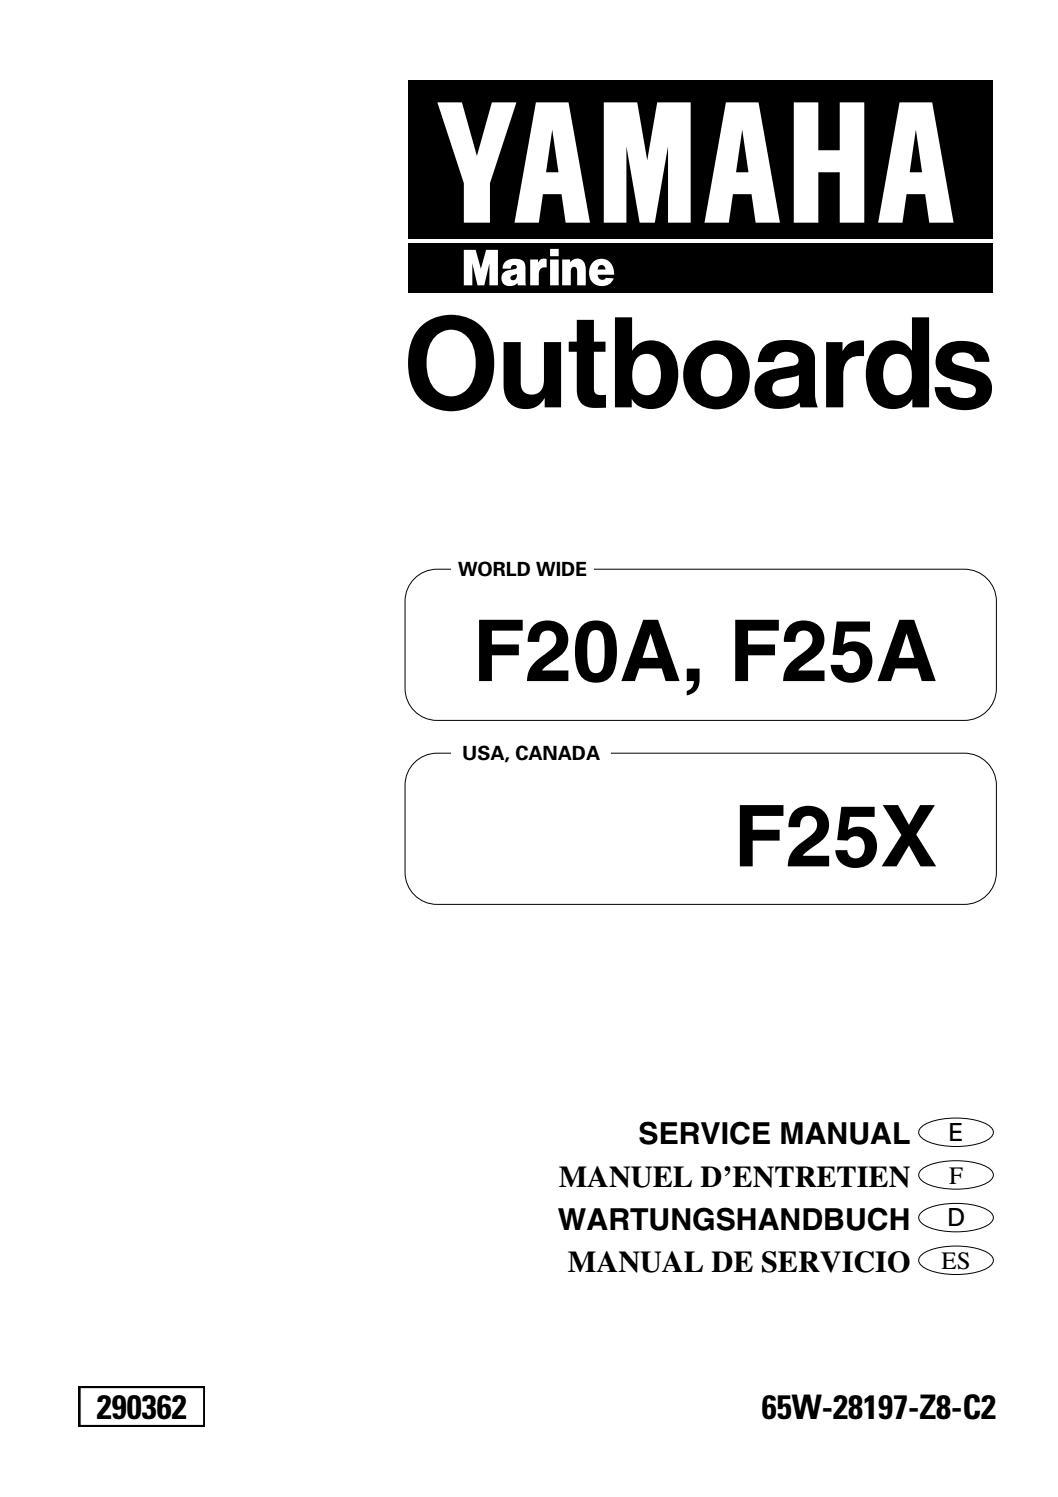 YAMAHA F25AEHT, F25TH OUTBOARD Service Repair Manual L